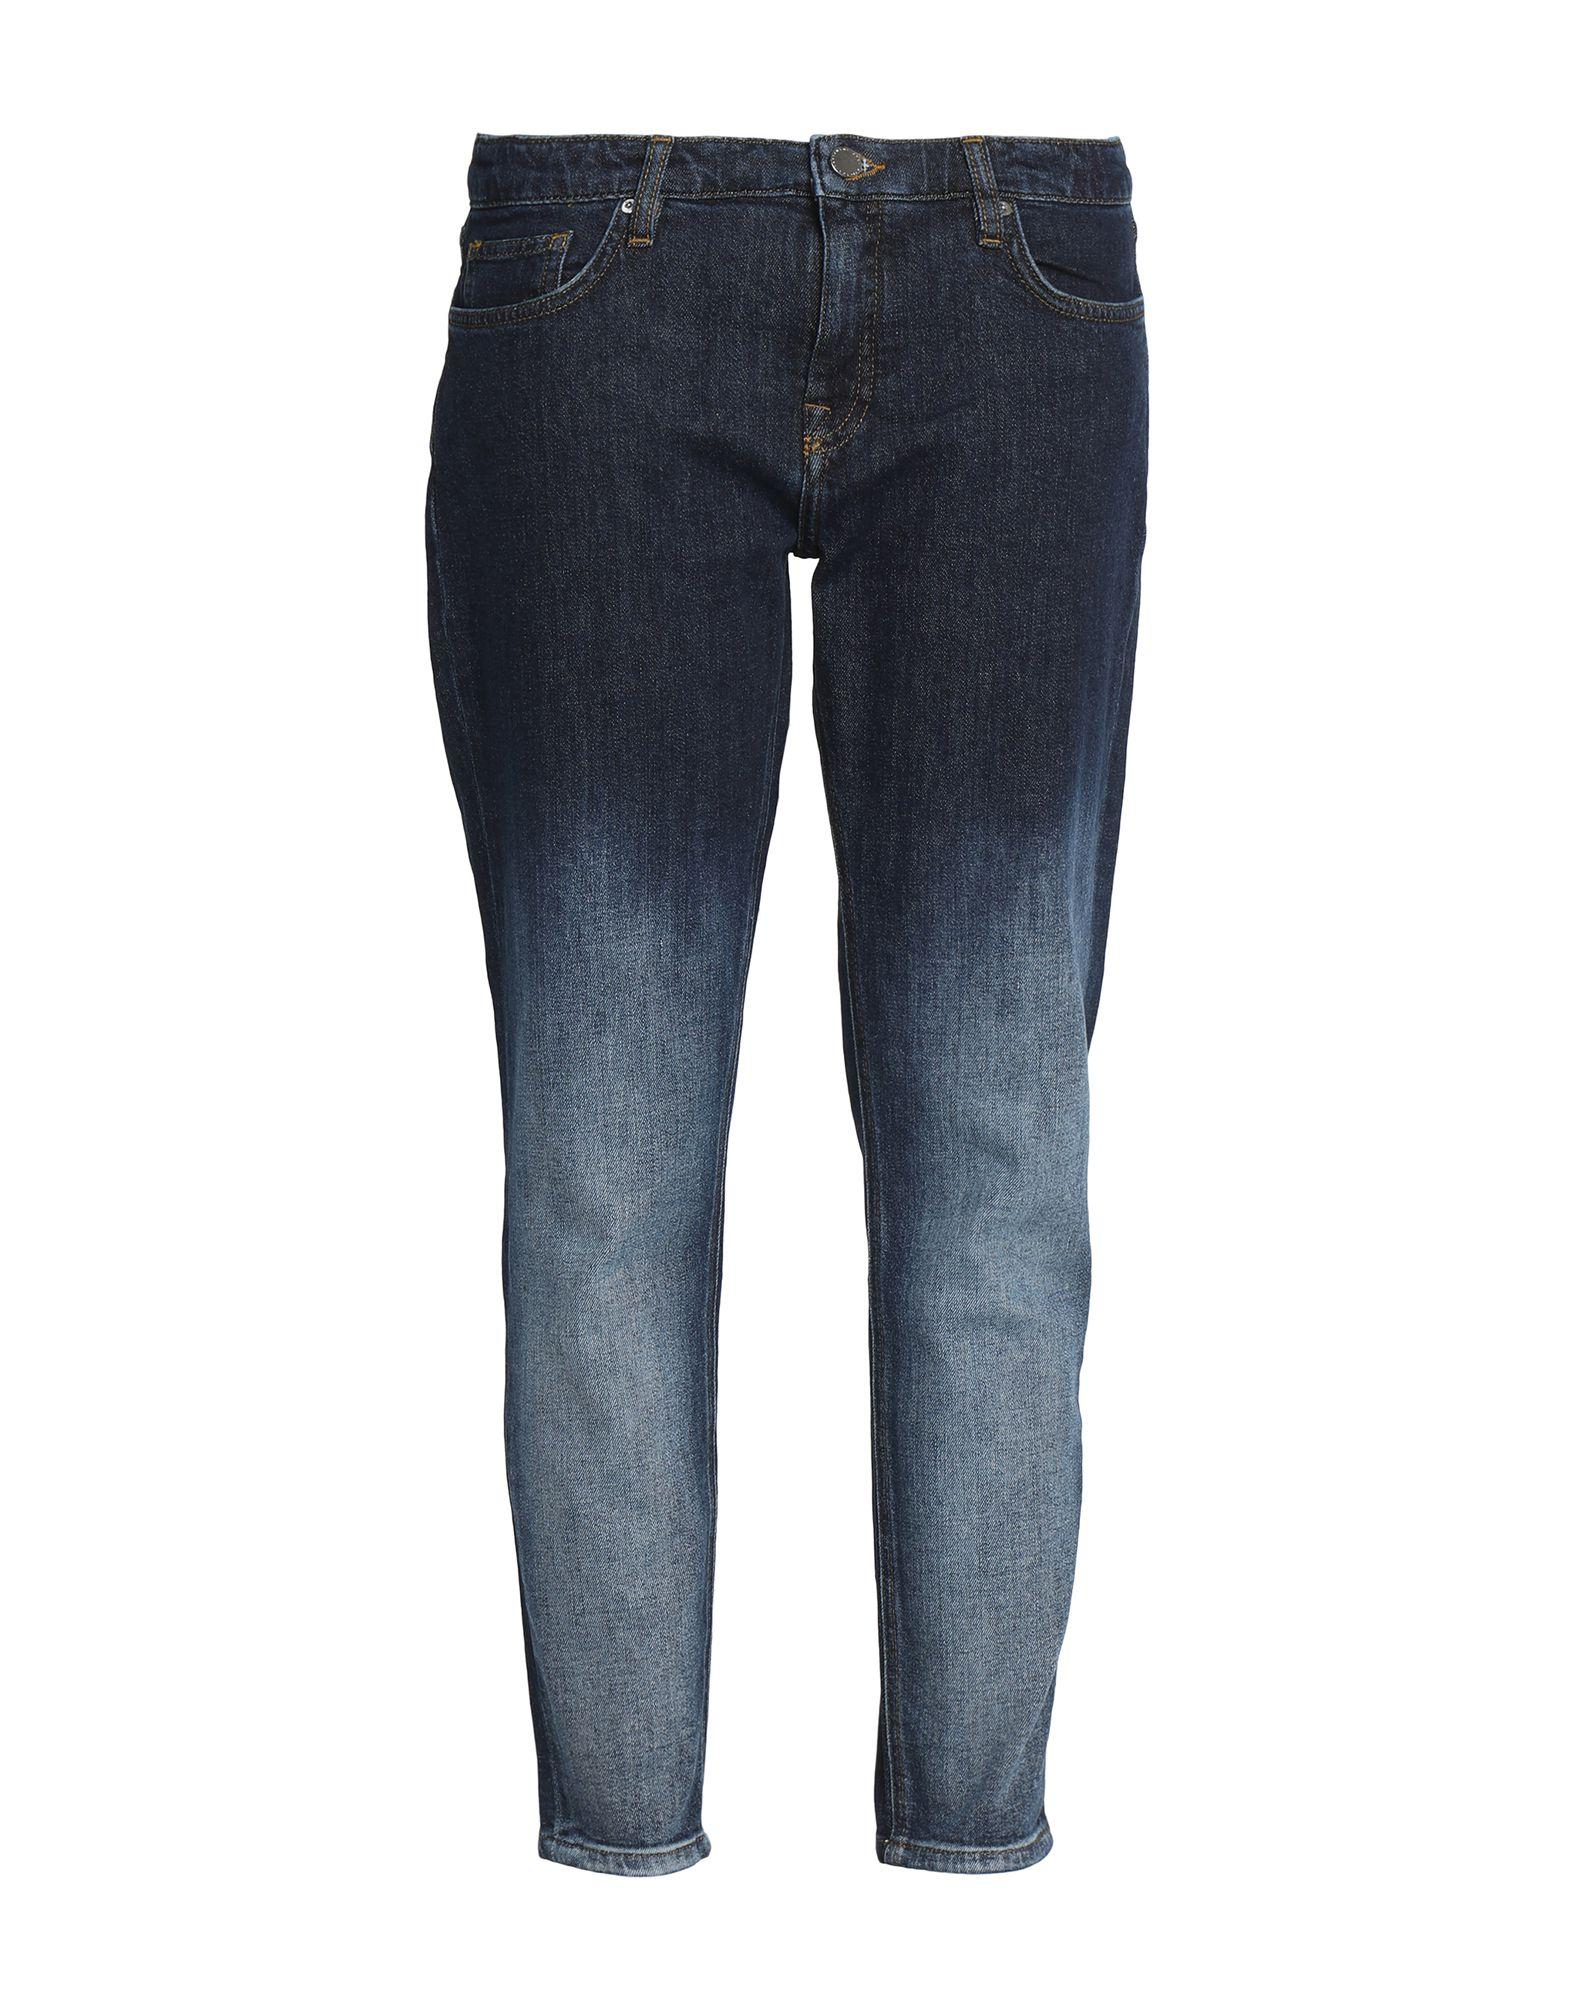 VICTORIA, VICTORIA BECKHAM Джинсовые брюки victoria beckham джинсовые брюки капри